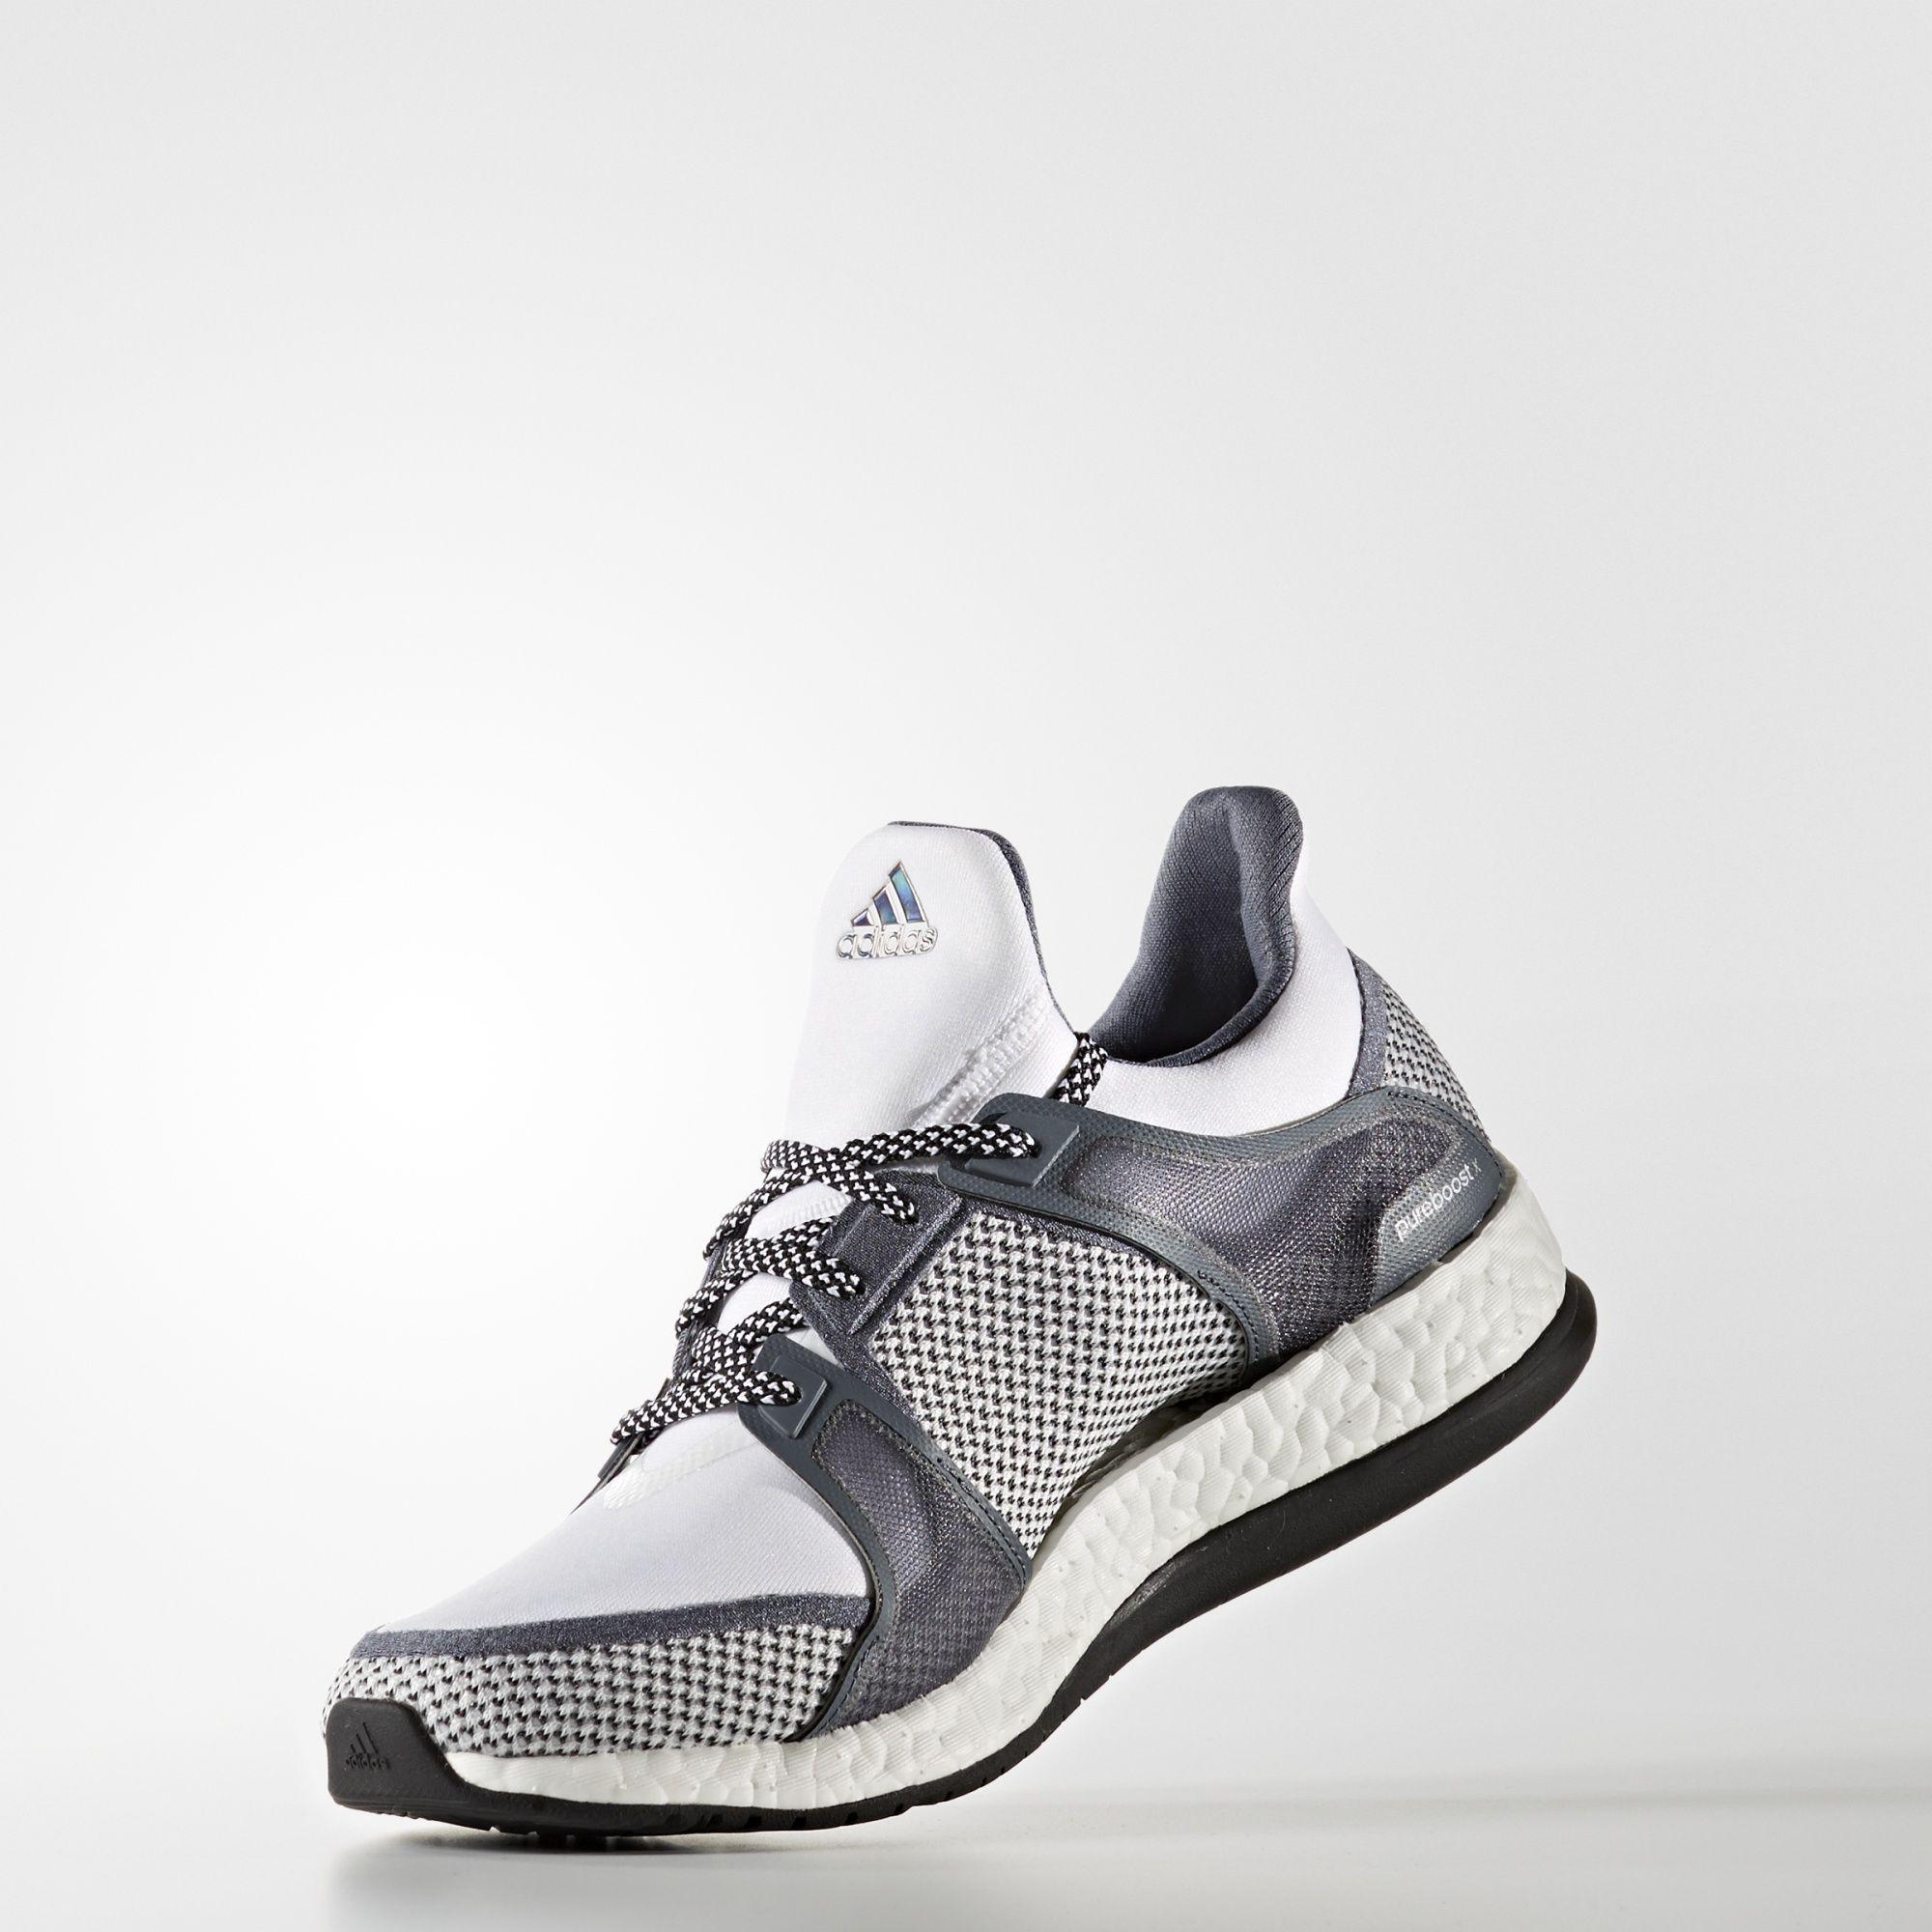 Adidas Pure Boost X Training Adidas Pure Boost Adidas Training Shoes